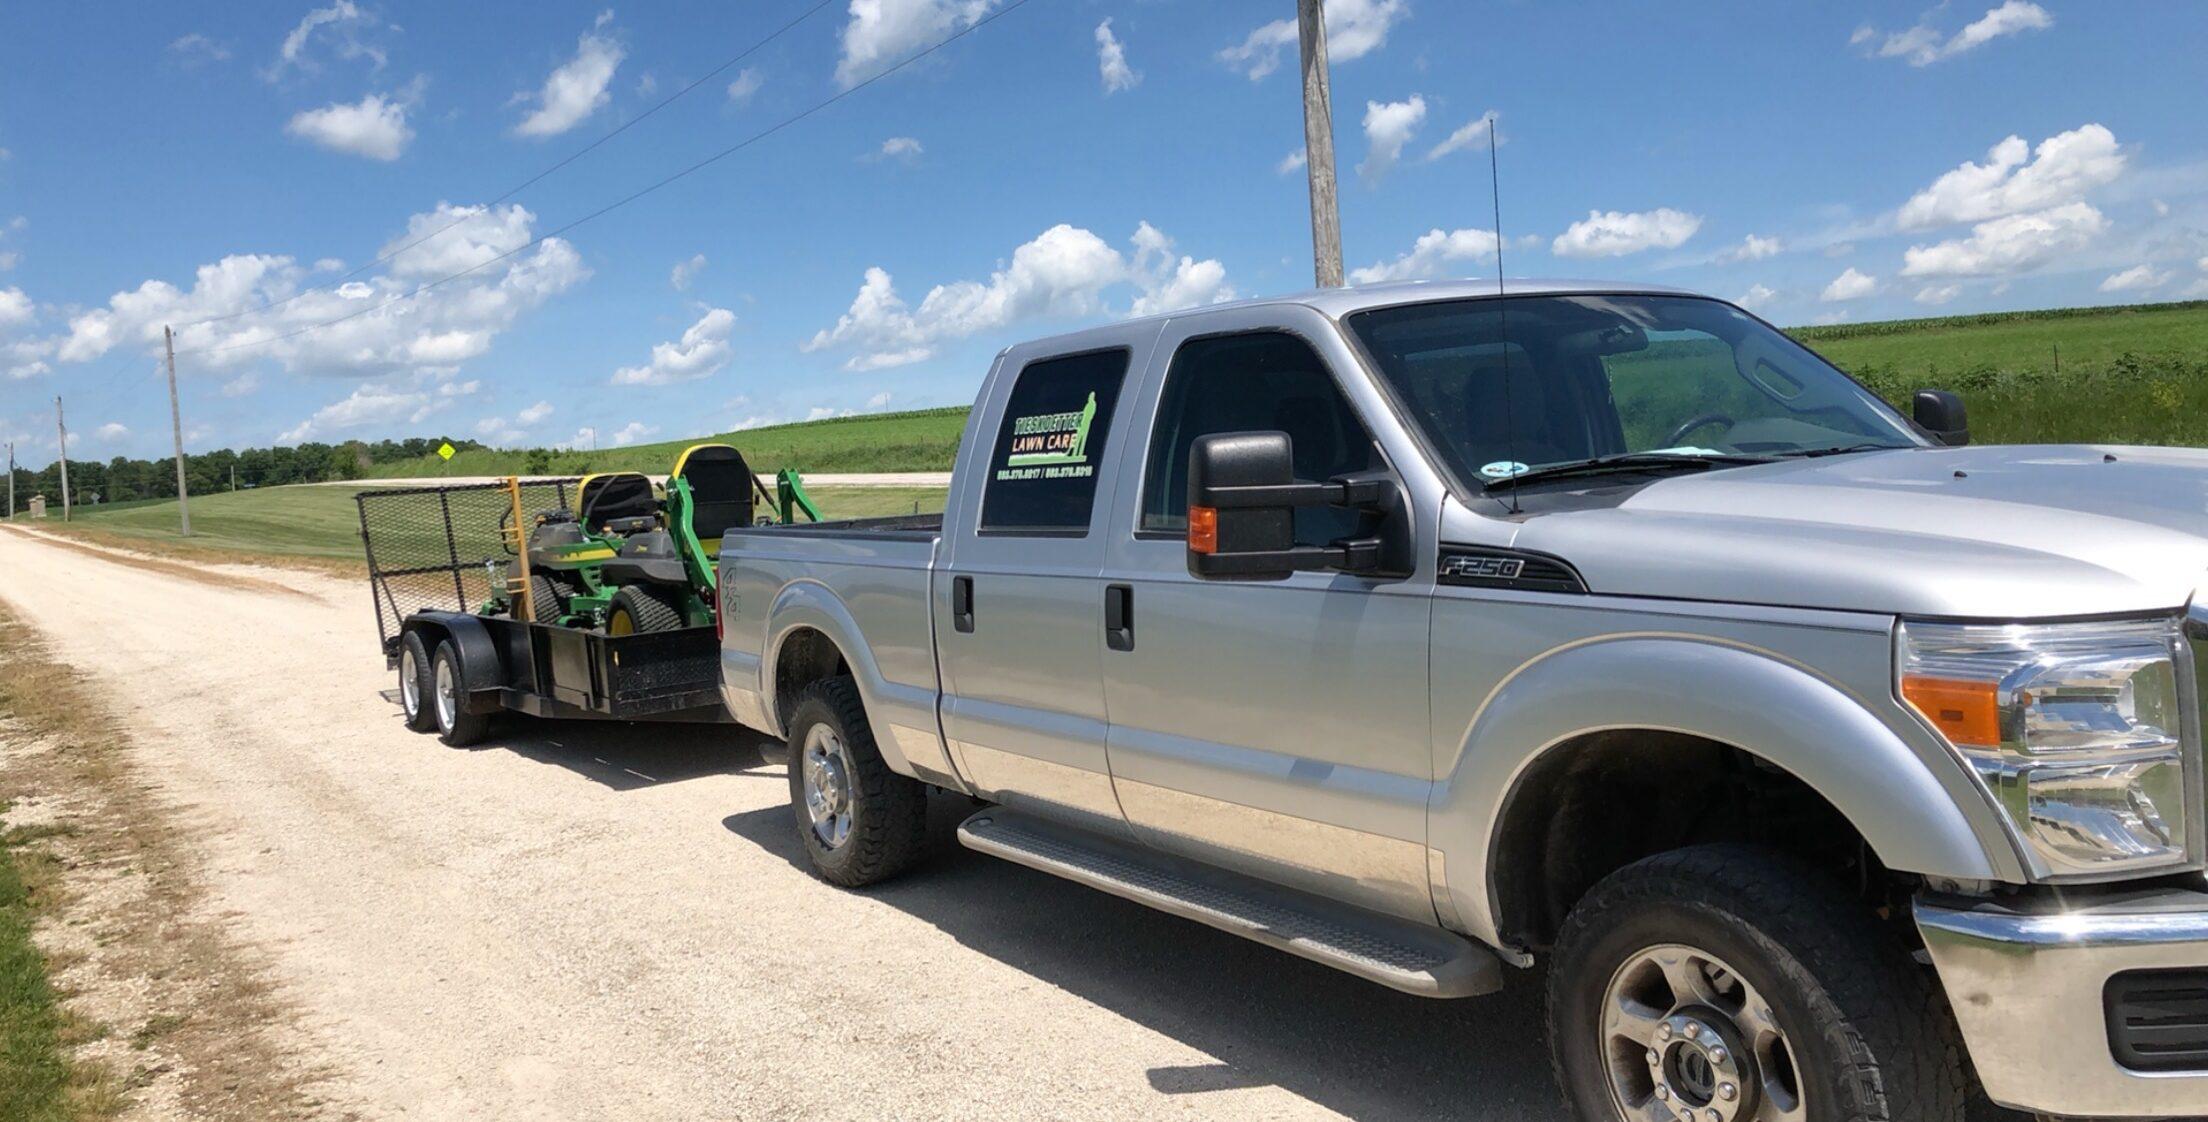 Lawn mower on trailer of a Tieskoetter Lawn Care truck